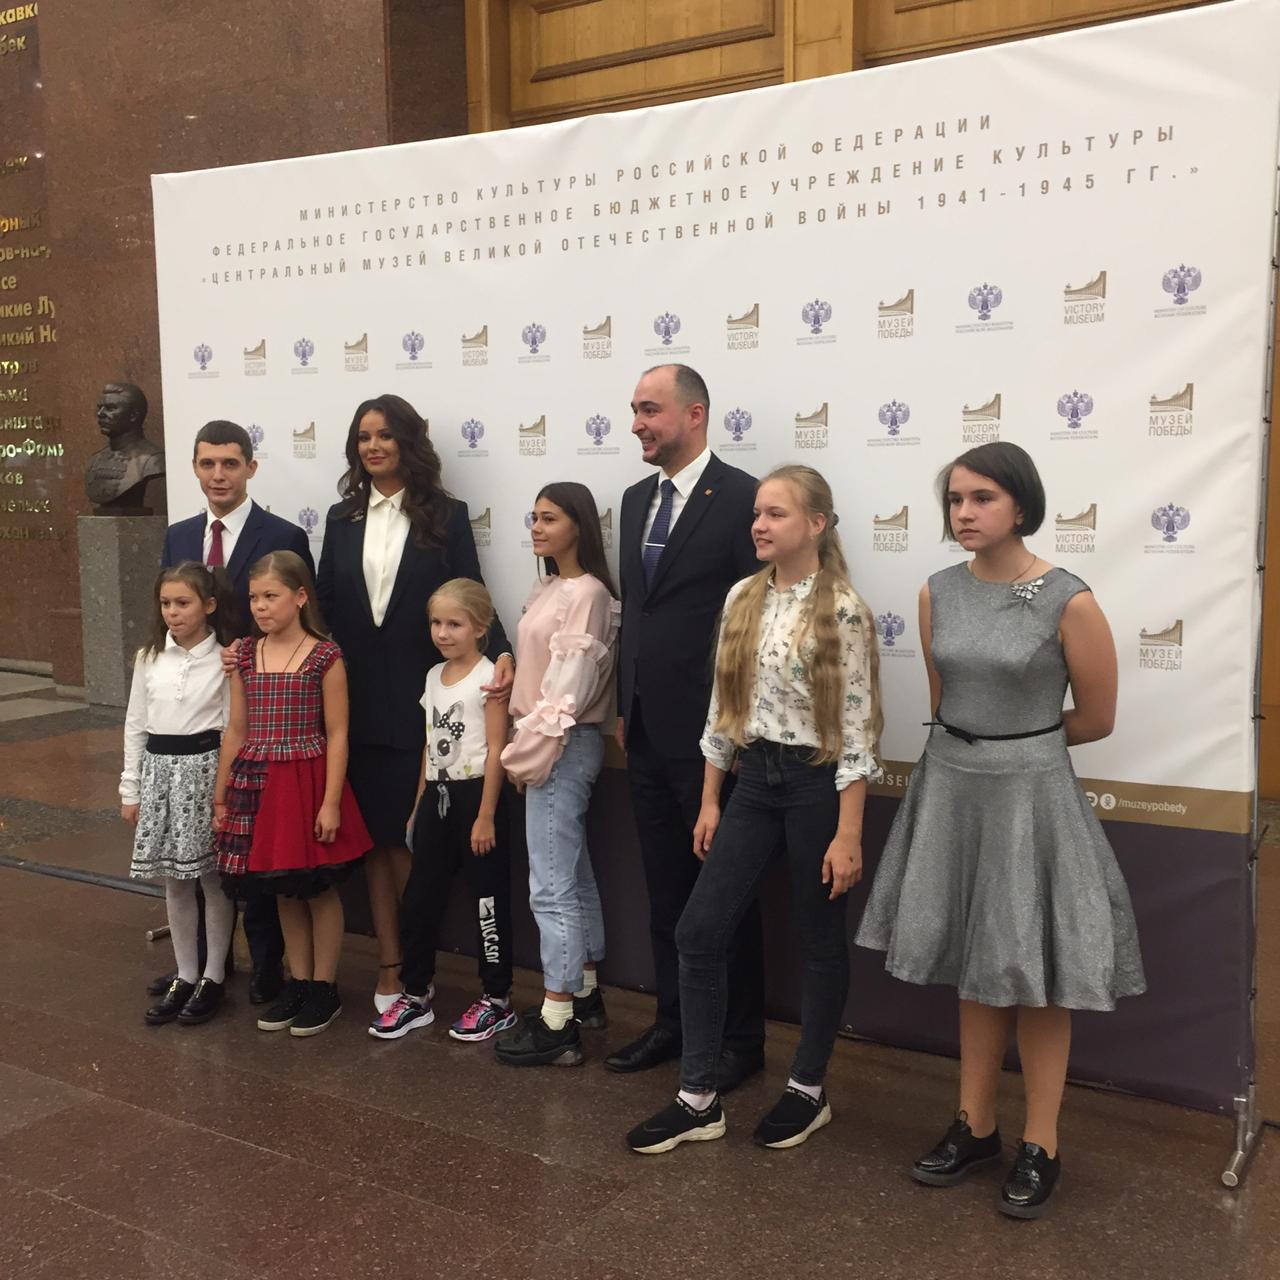 Оксана Фёдорова вручила награды детям — авторам лучших рисунков